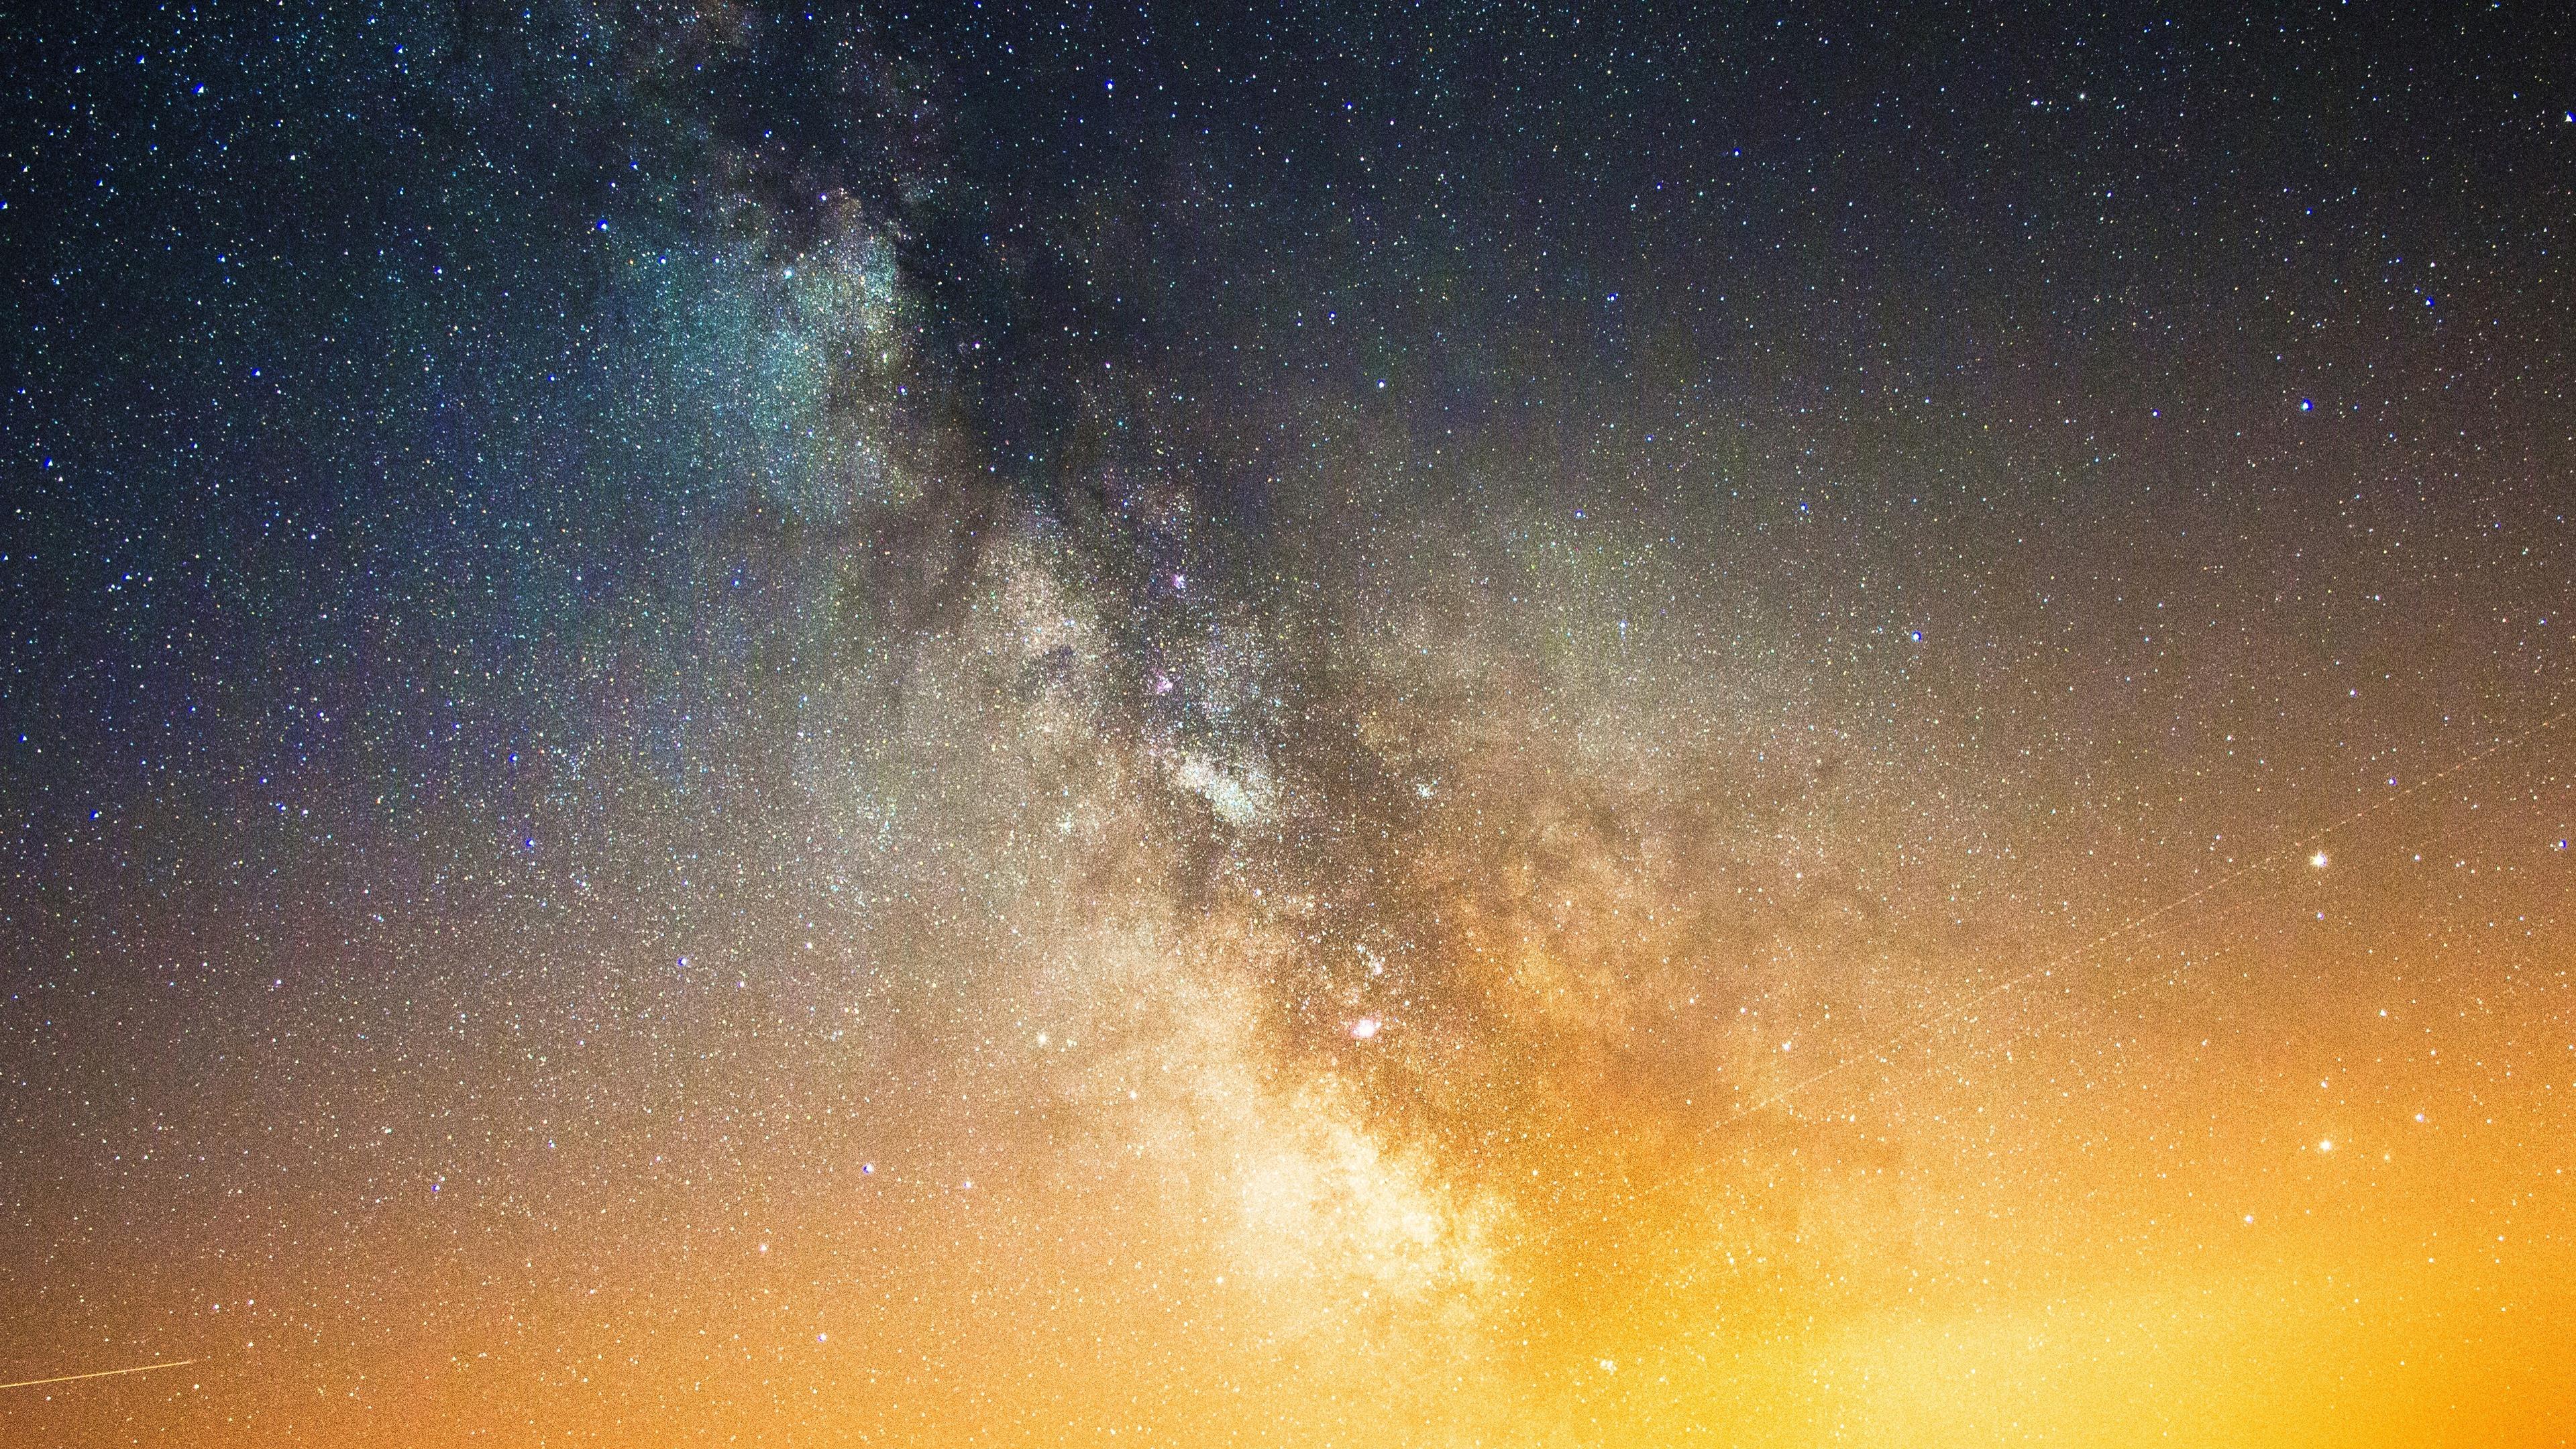 Space Milky Way 4K 4K Wallpaper